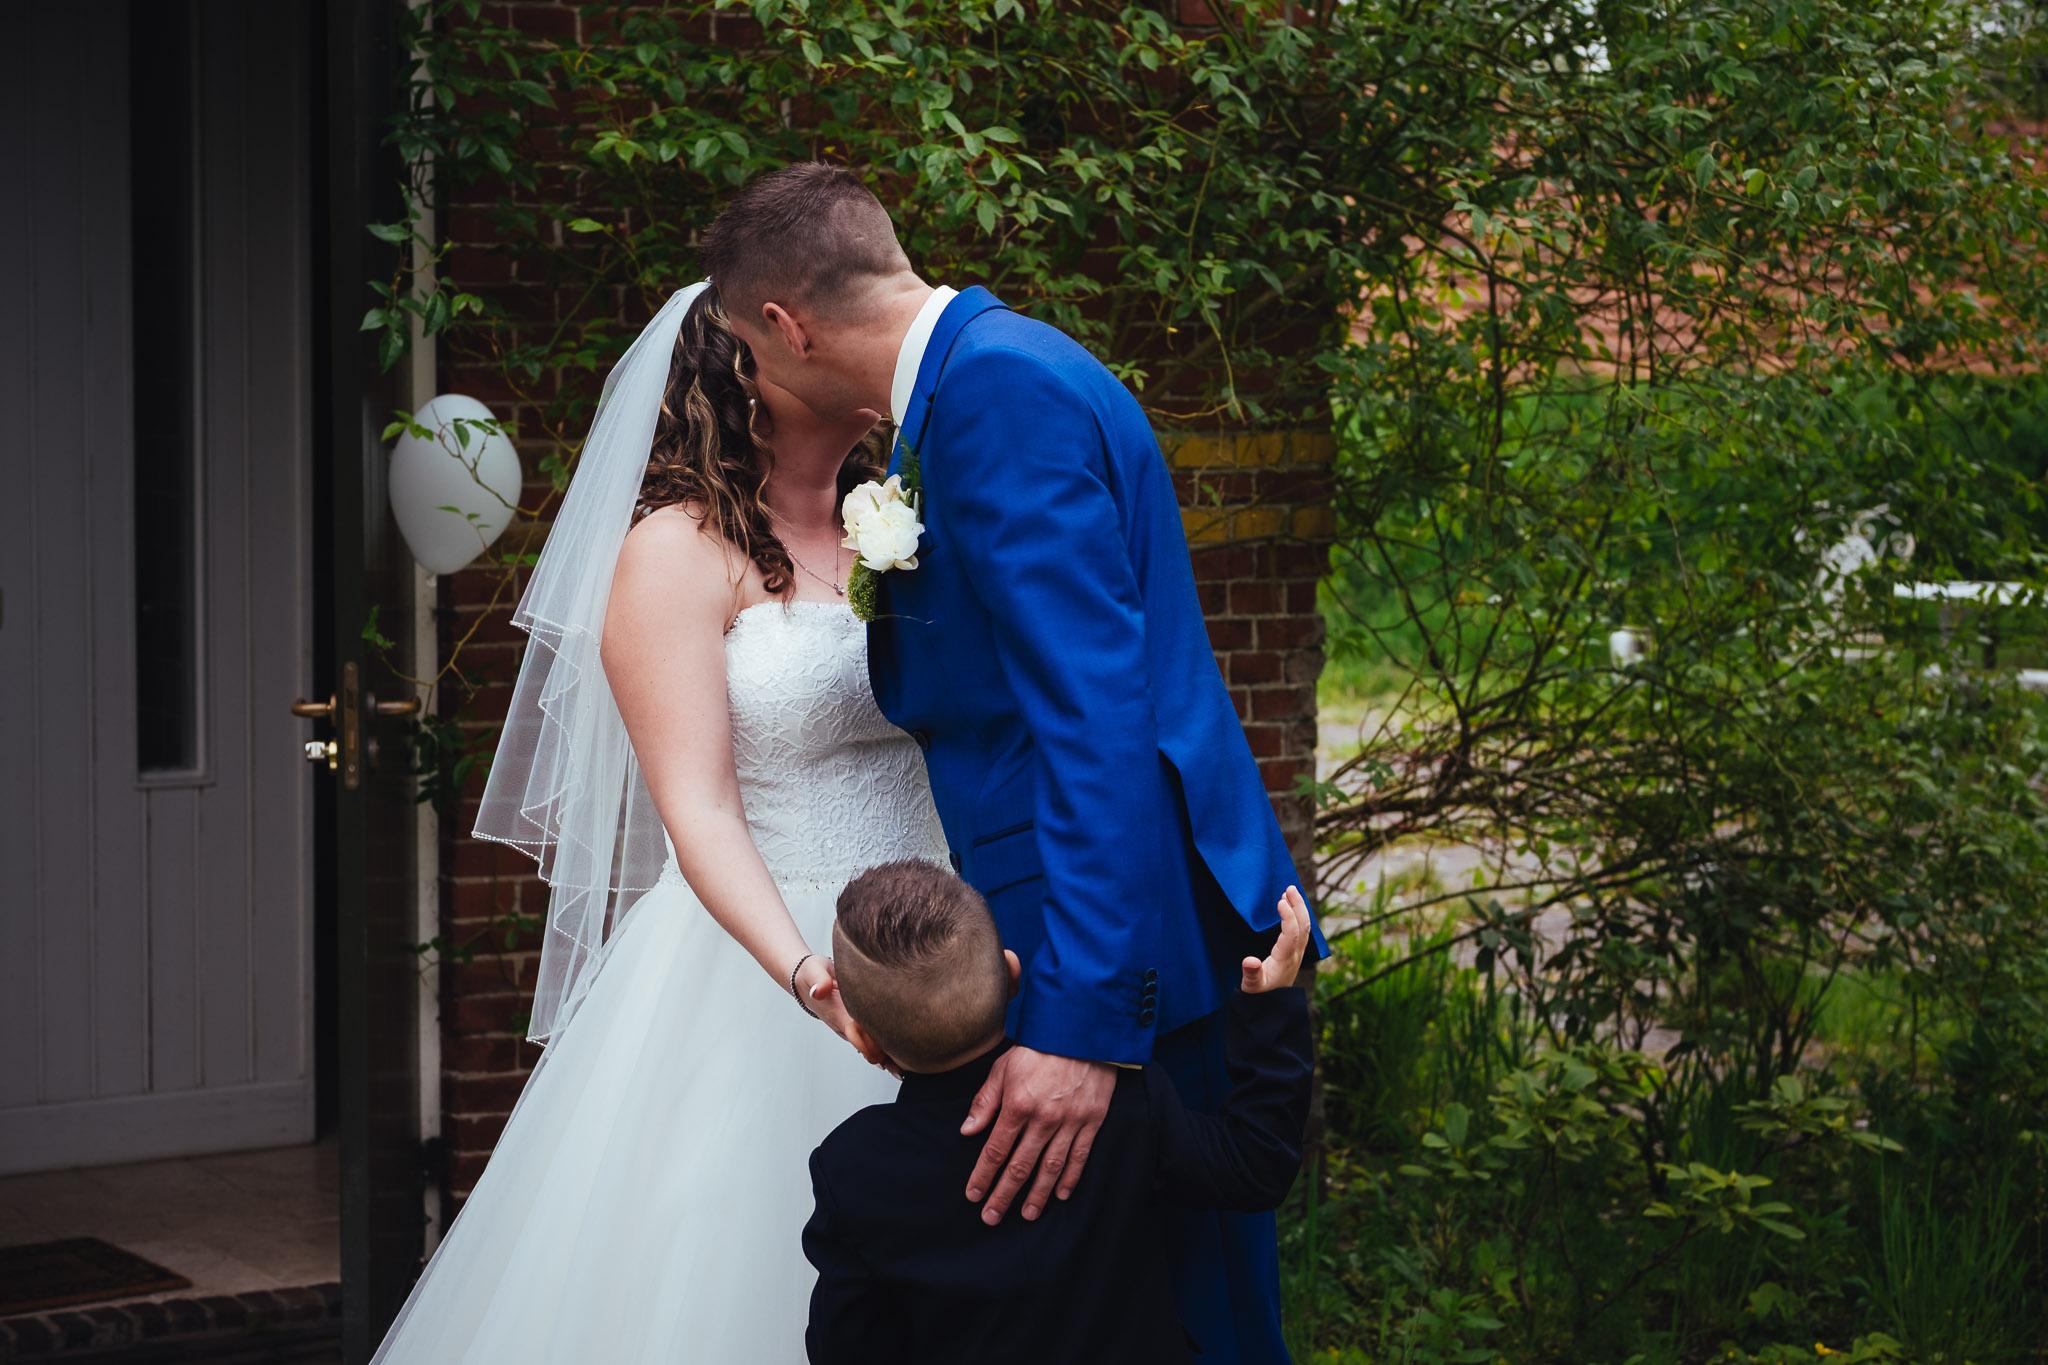 bruiloft op landgoed westerlee in groningen met dilek en tim eerste blik